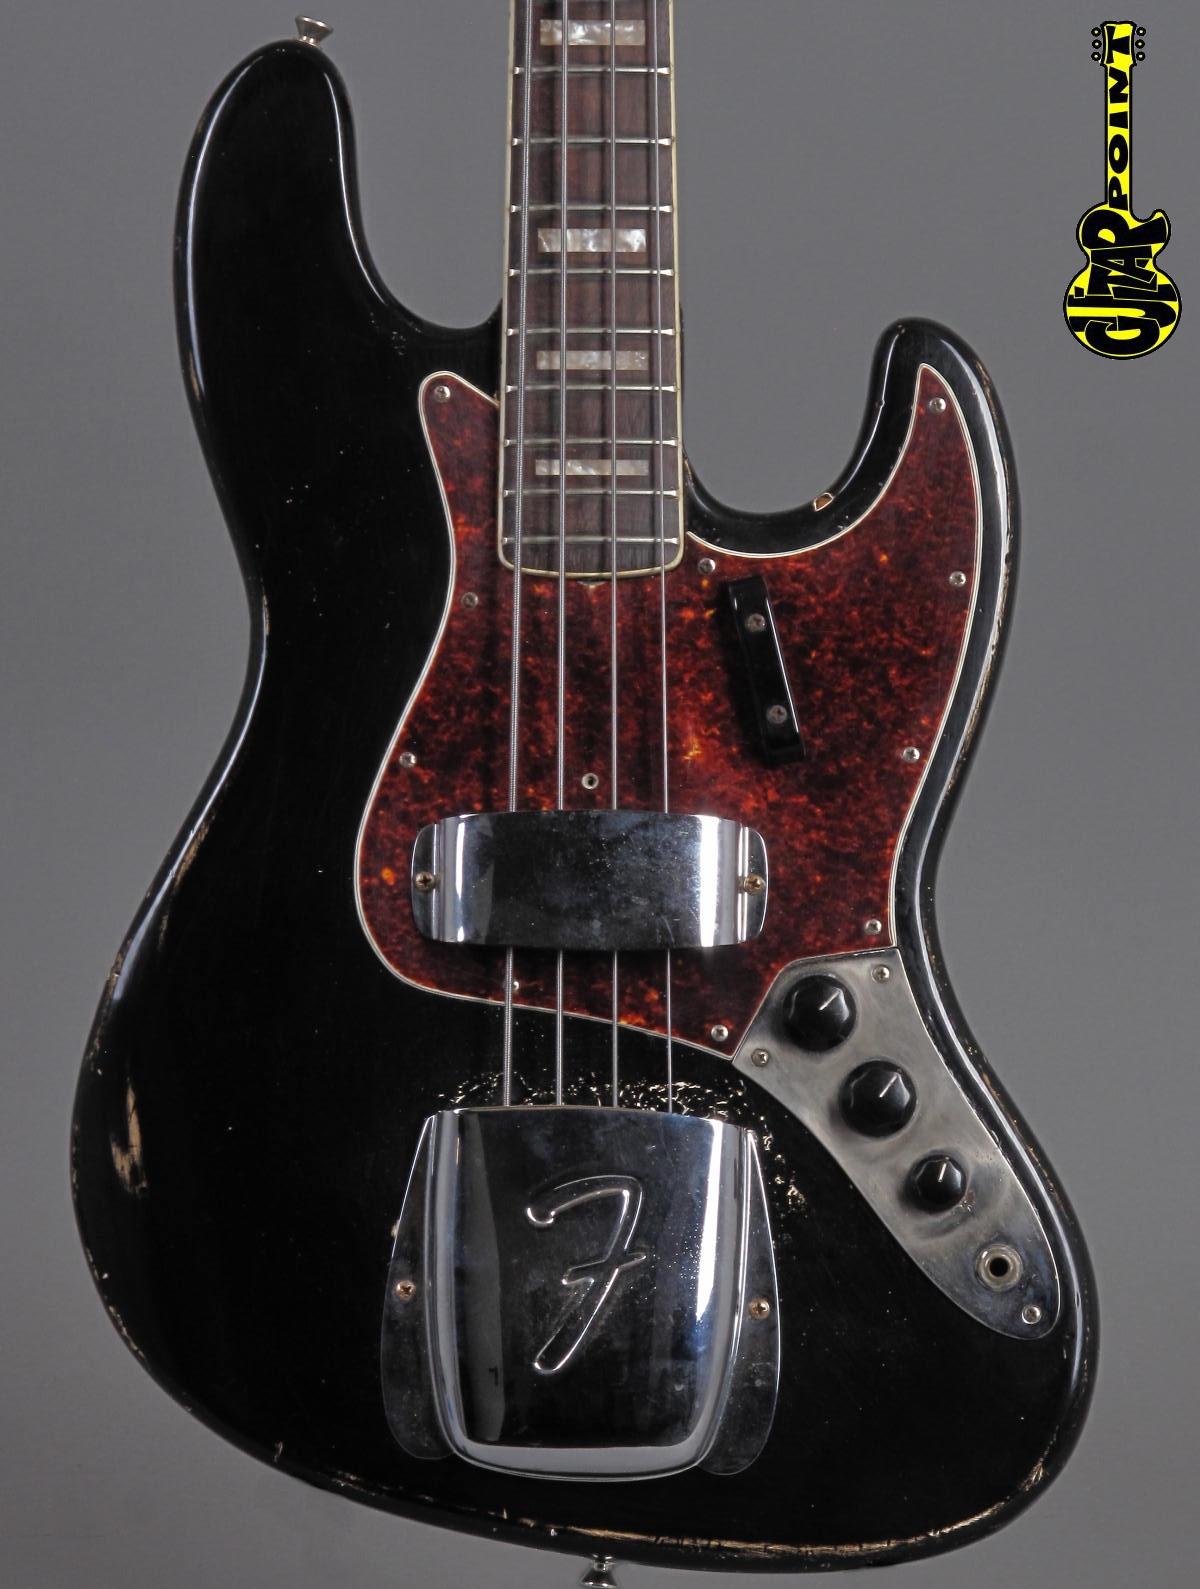 1969 Fender Jazz Bass - Black